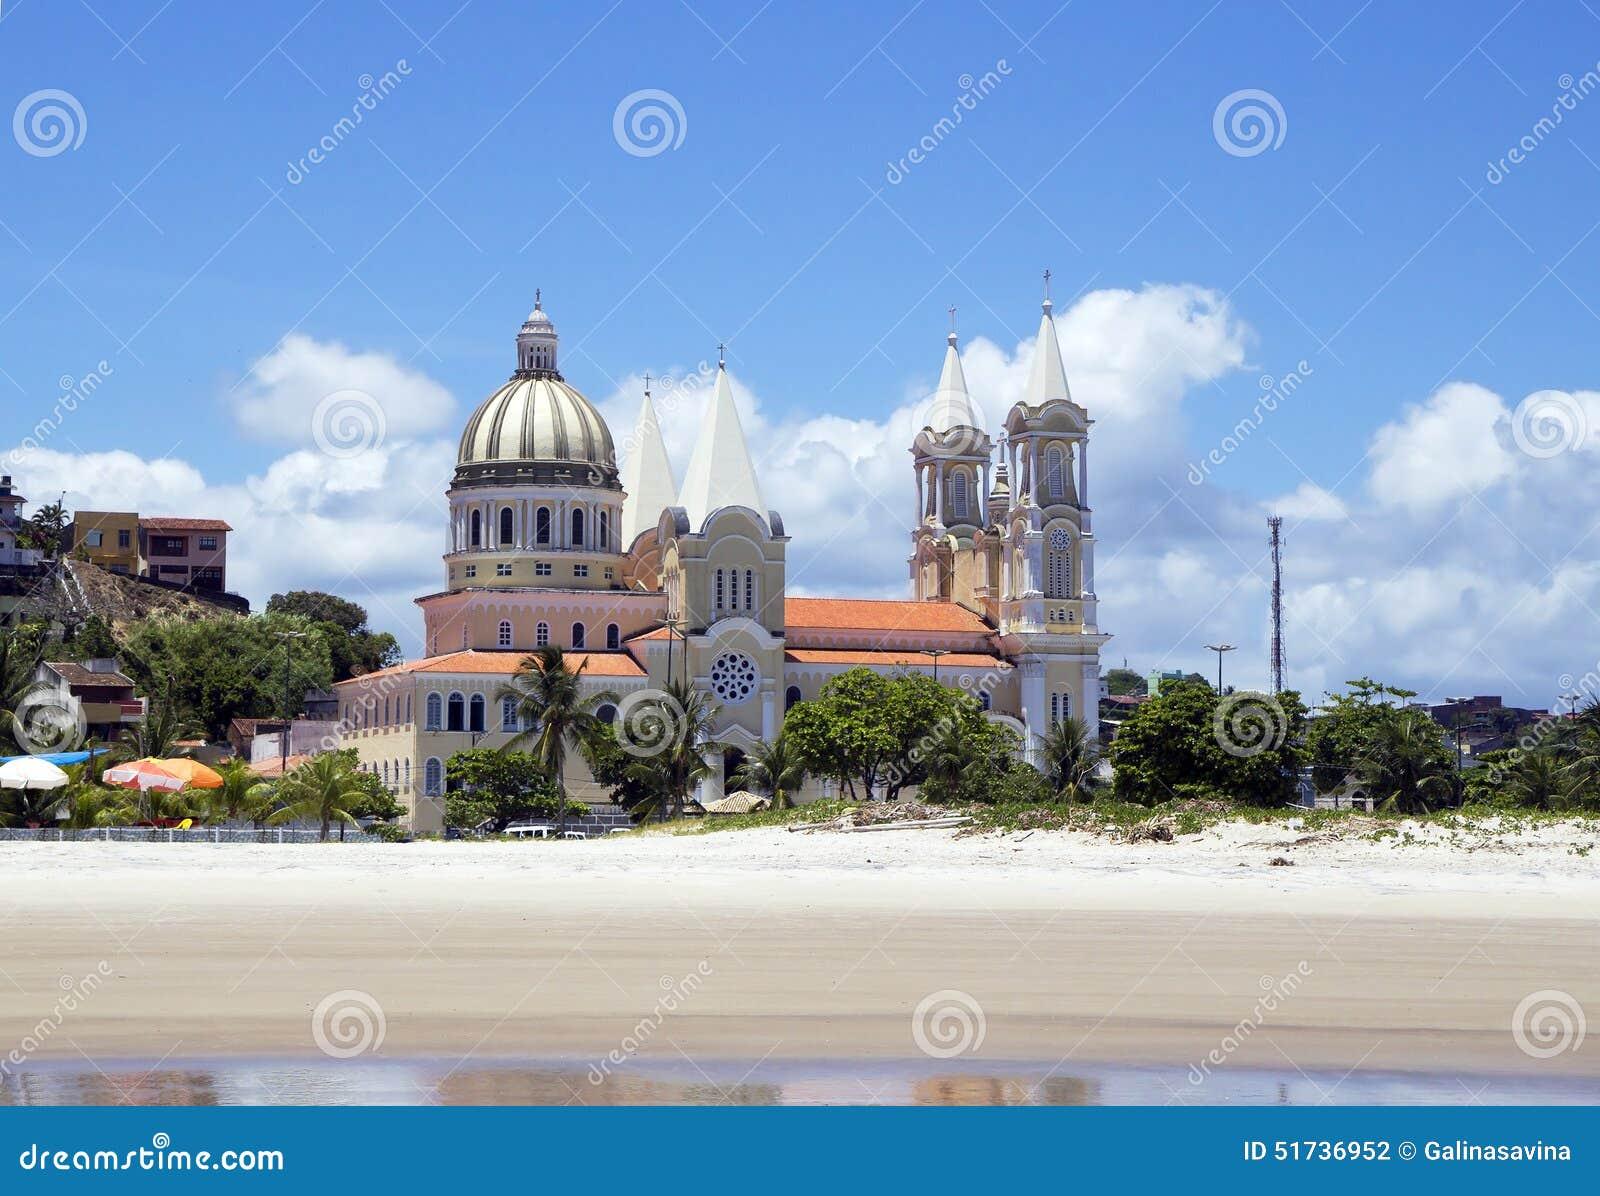 kathedrale in ilheus brasilien stockfoto bild von christentum kathedrale 51736952. Black Bedroom Furniture Sets. Home Design Ideas